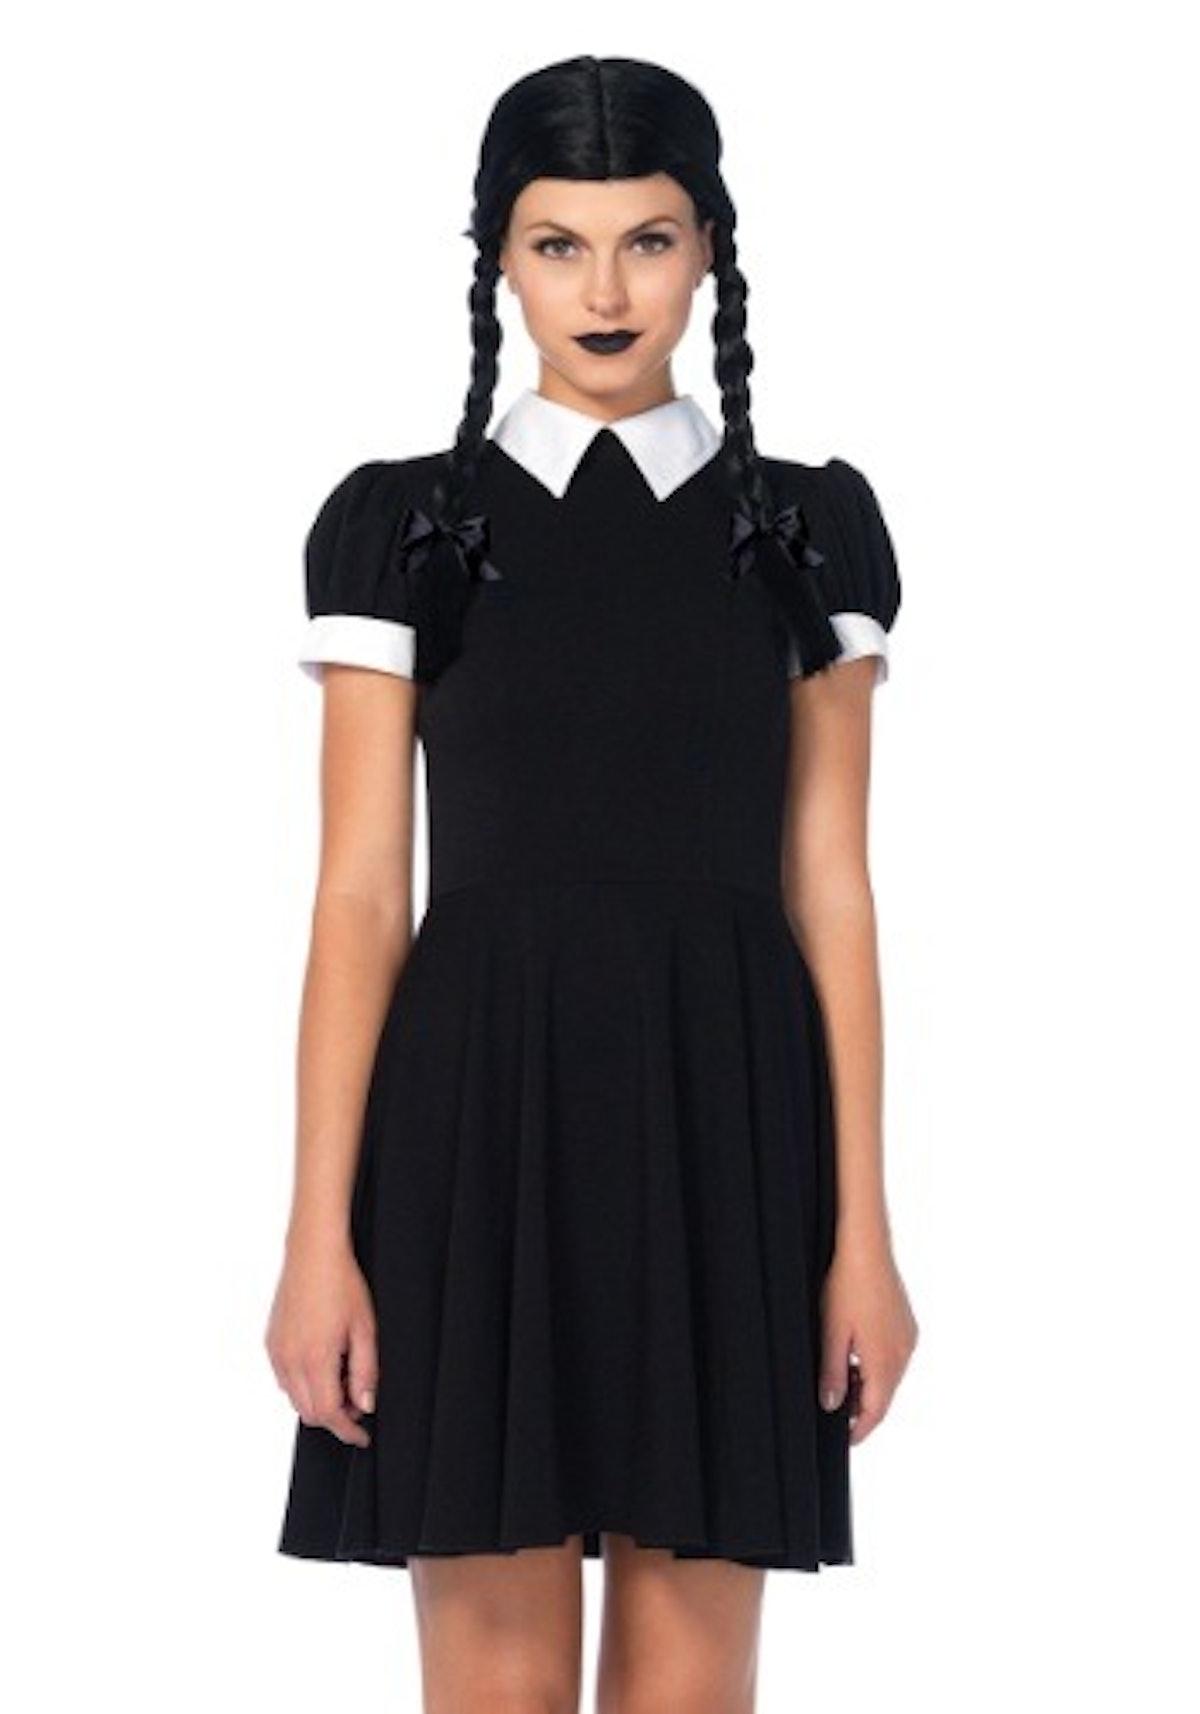 Halloween Costumes Women's Gothic Darling Costume